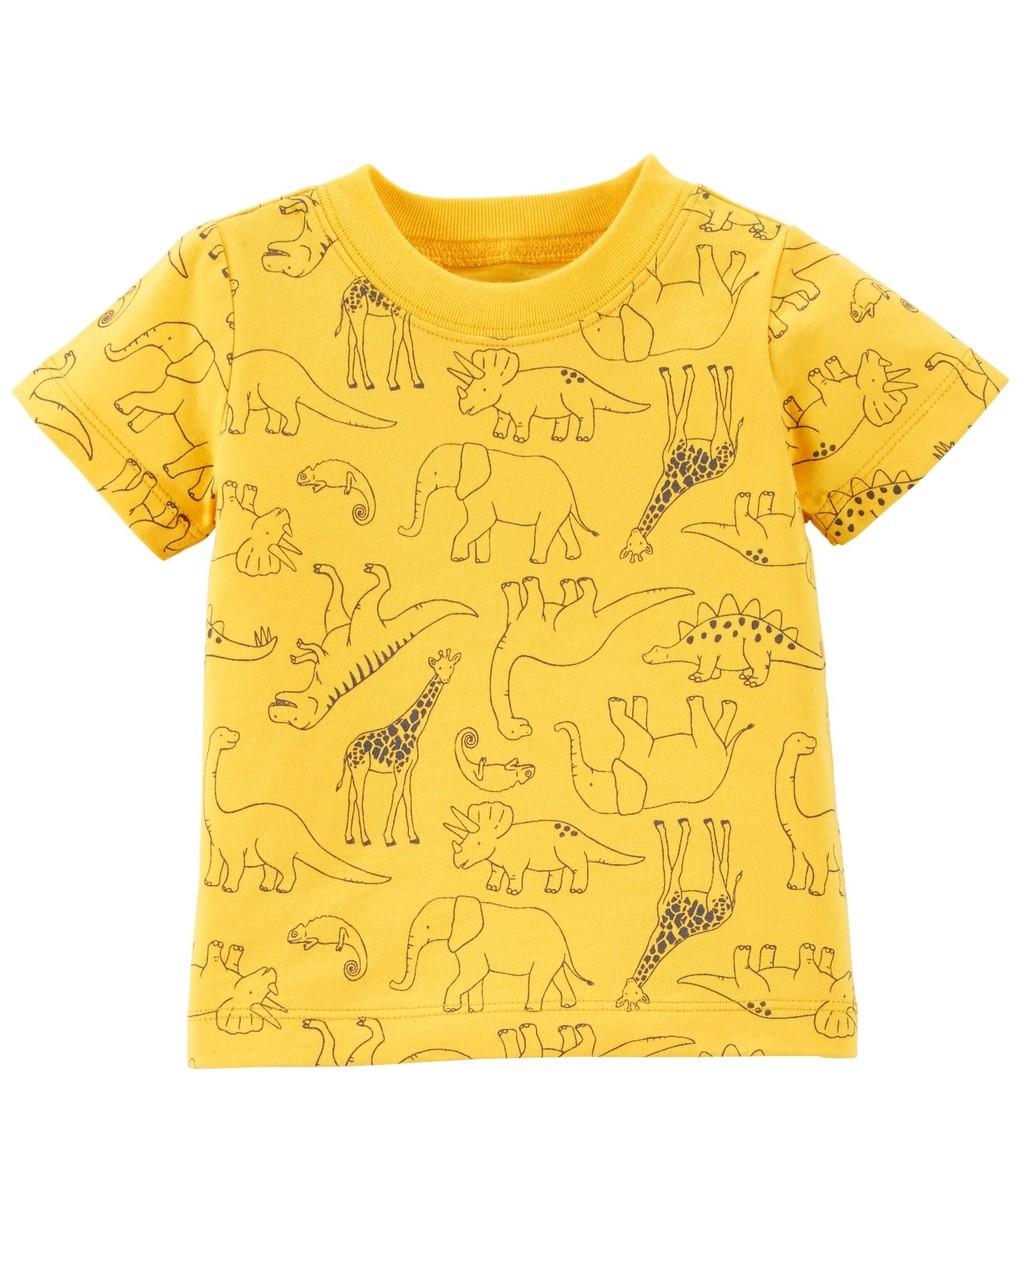 Jardineira Jeans e Camiseta Animais